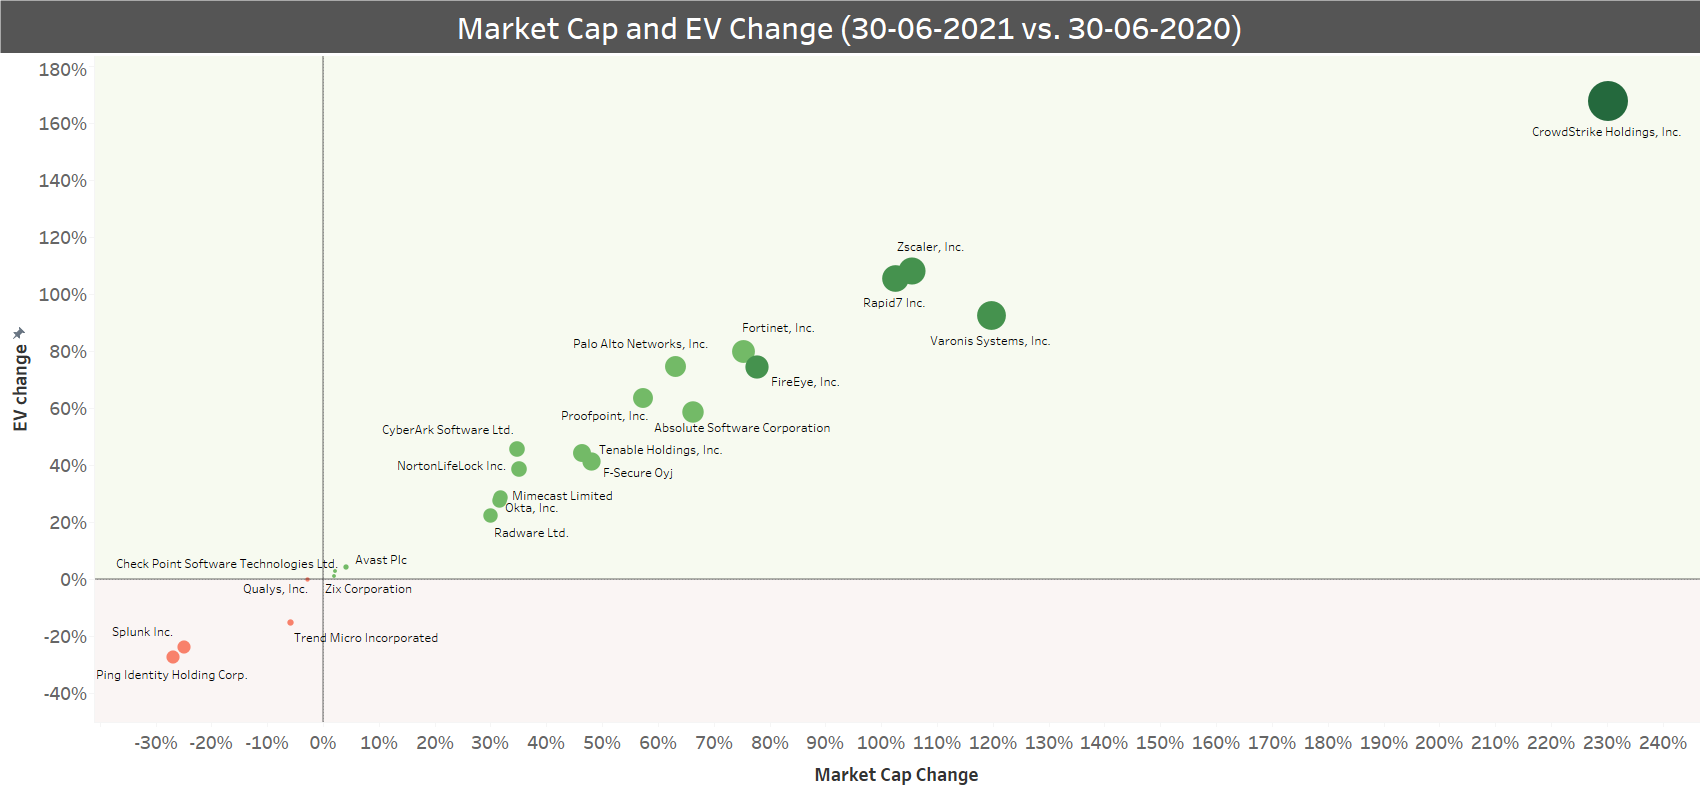 Market cap and EV change (30-06-2021 vs 30-06-2020)